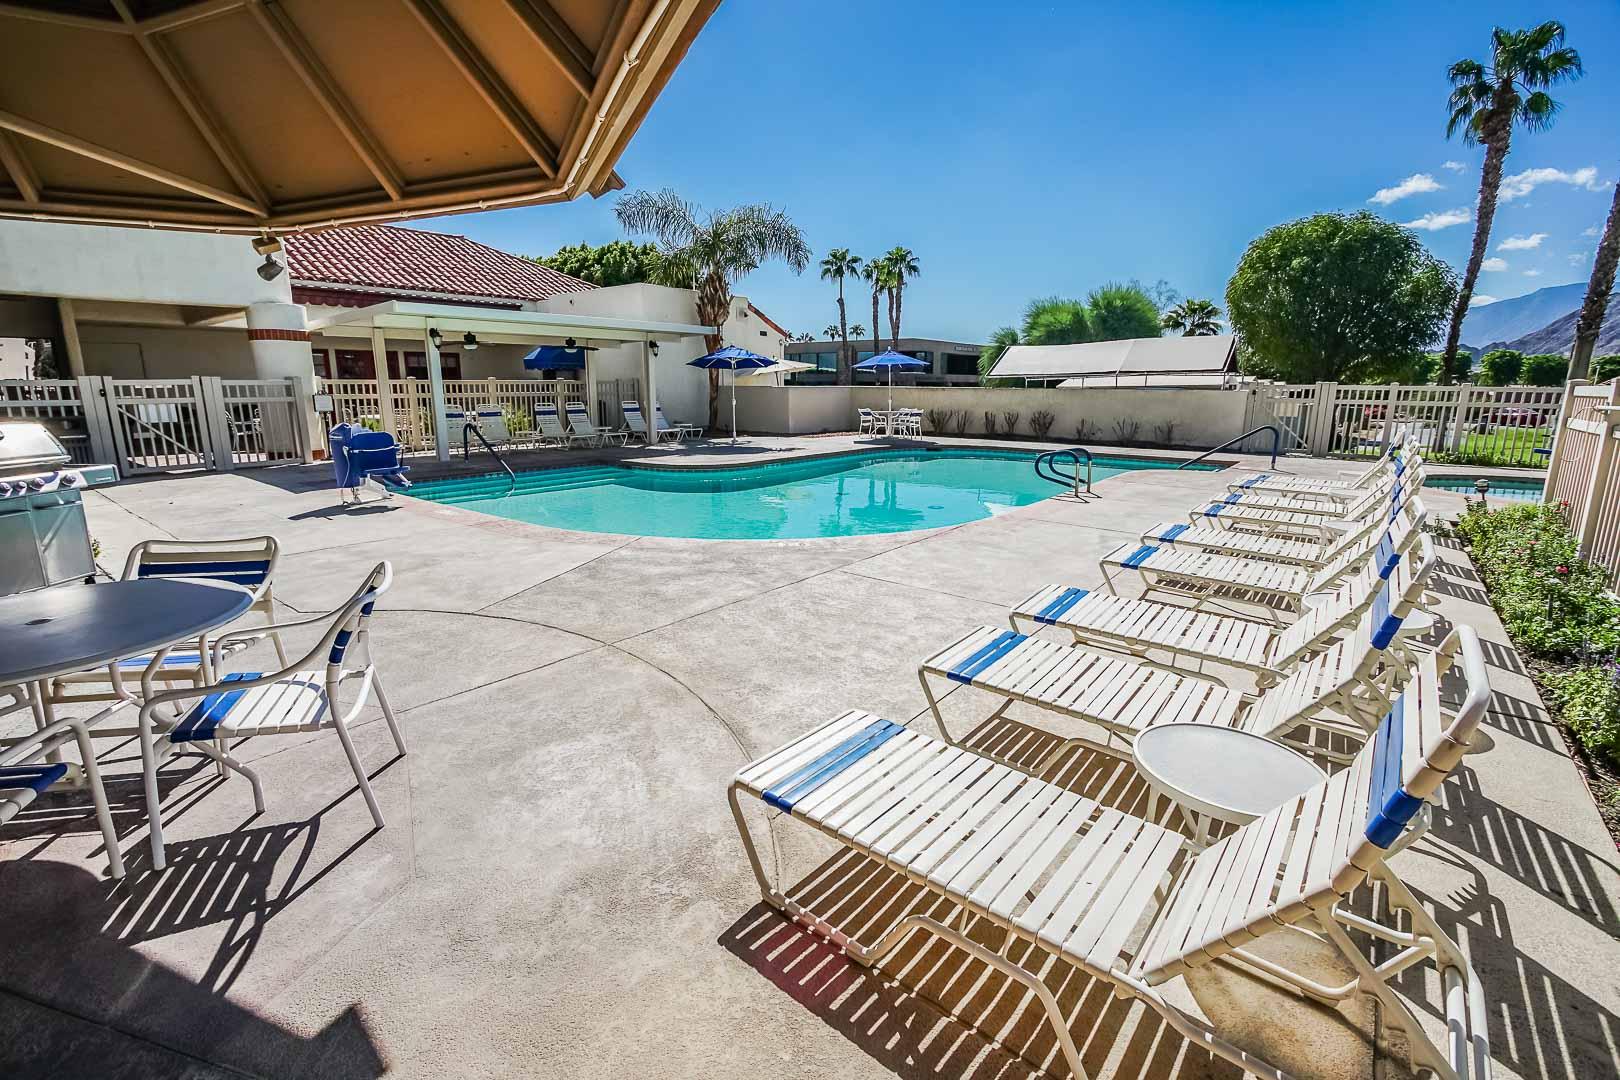 A soothing pool at VRI Americas' Desert Breezes Resort in California